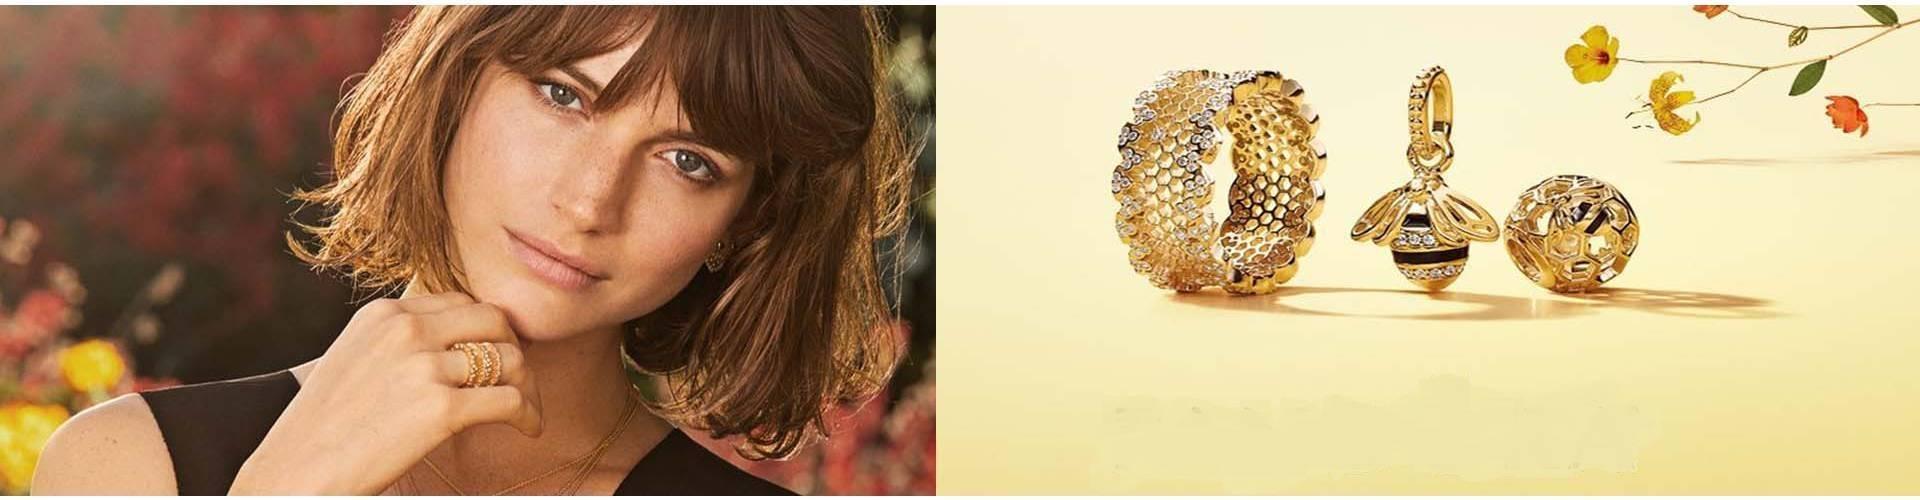 pandora shine bracelets